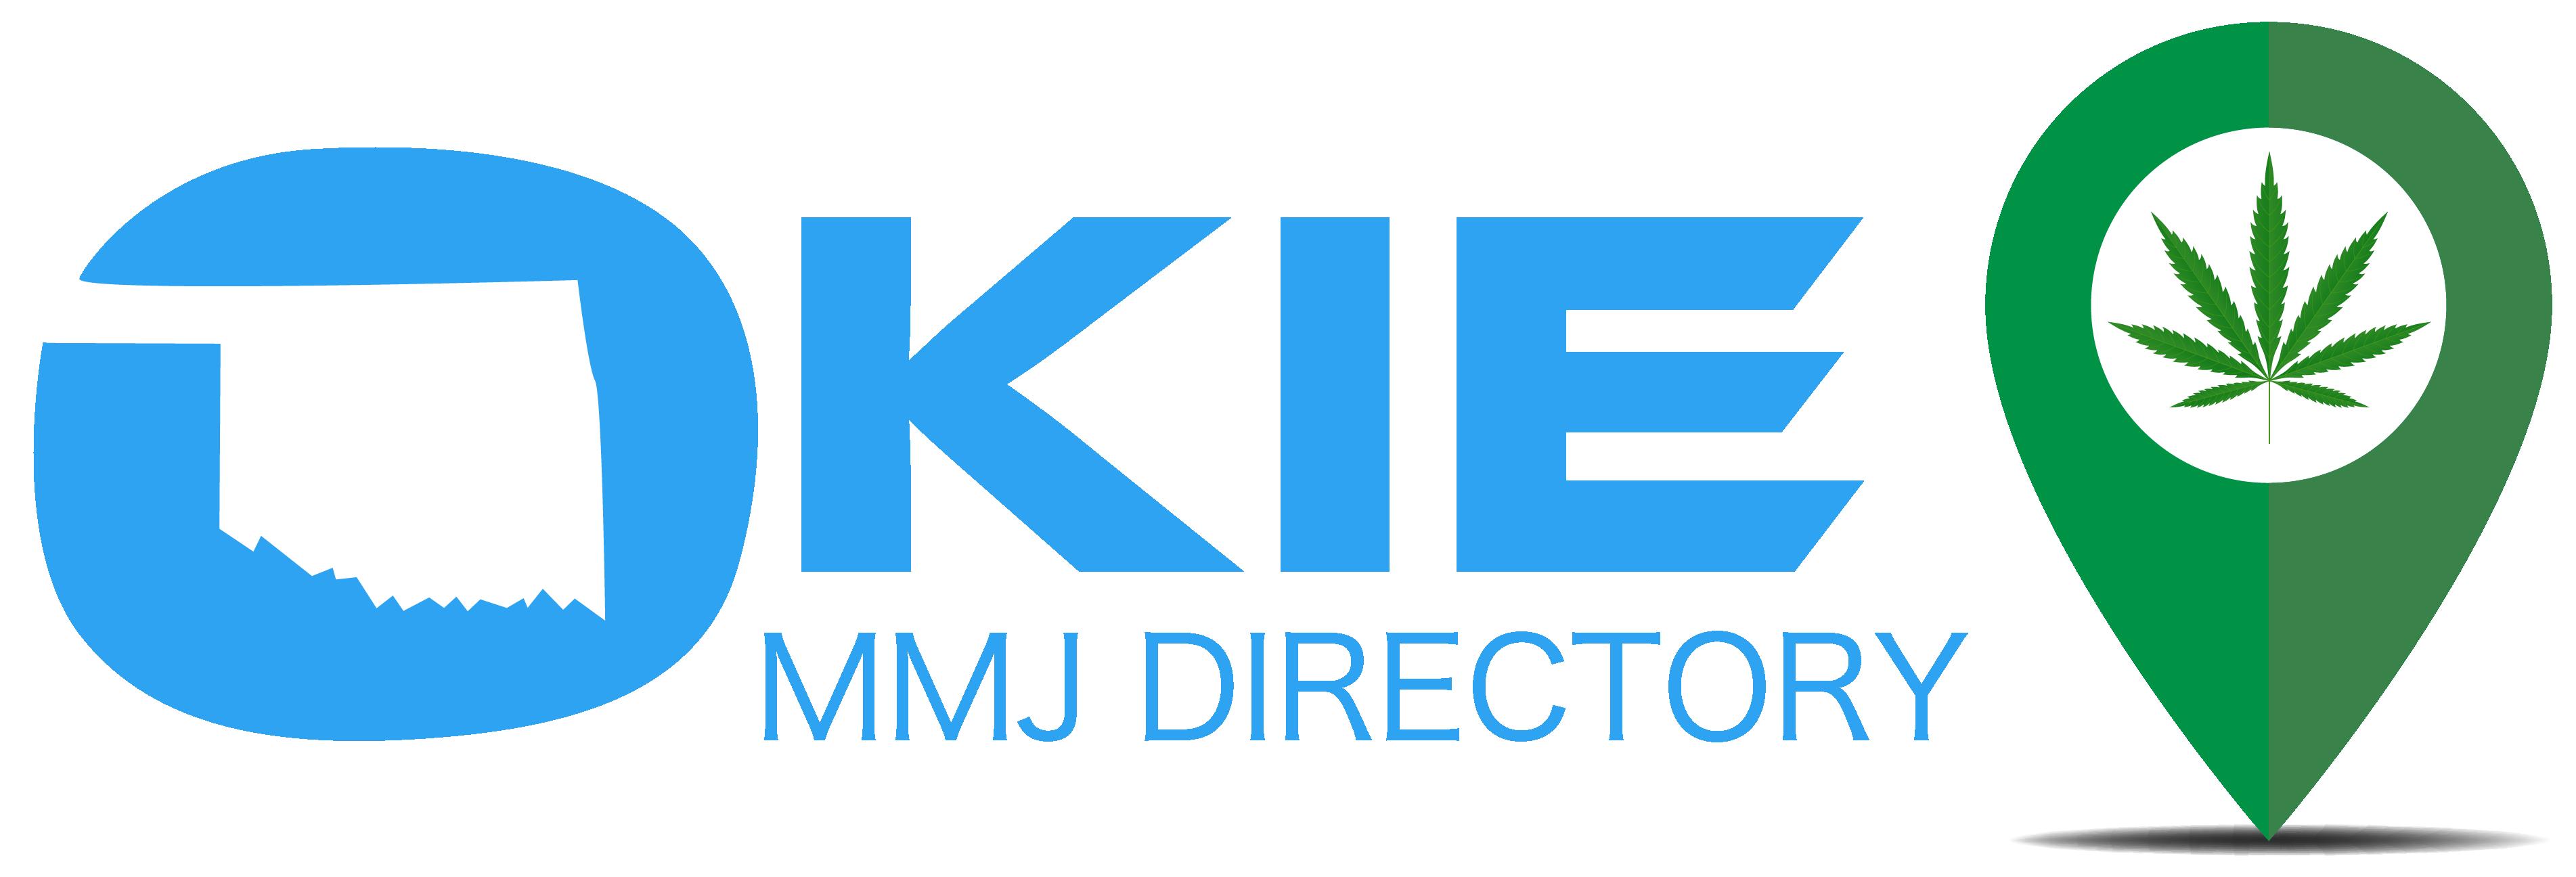 Okie MMJ Directory